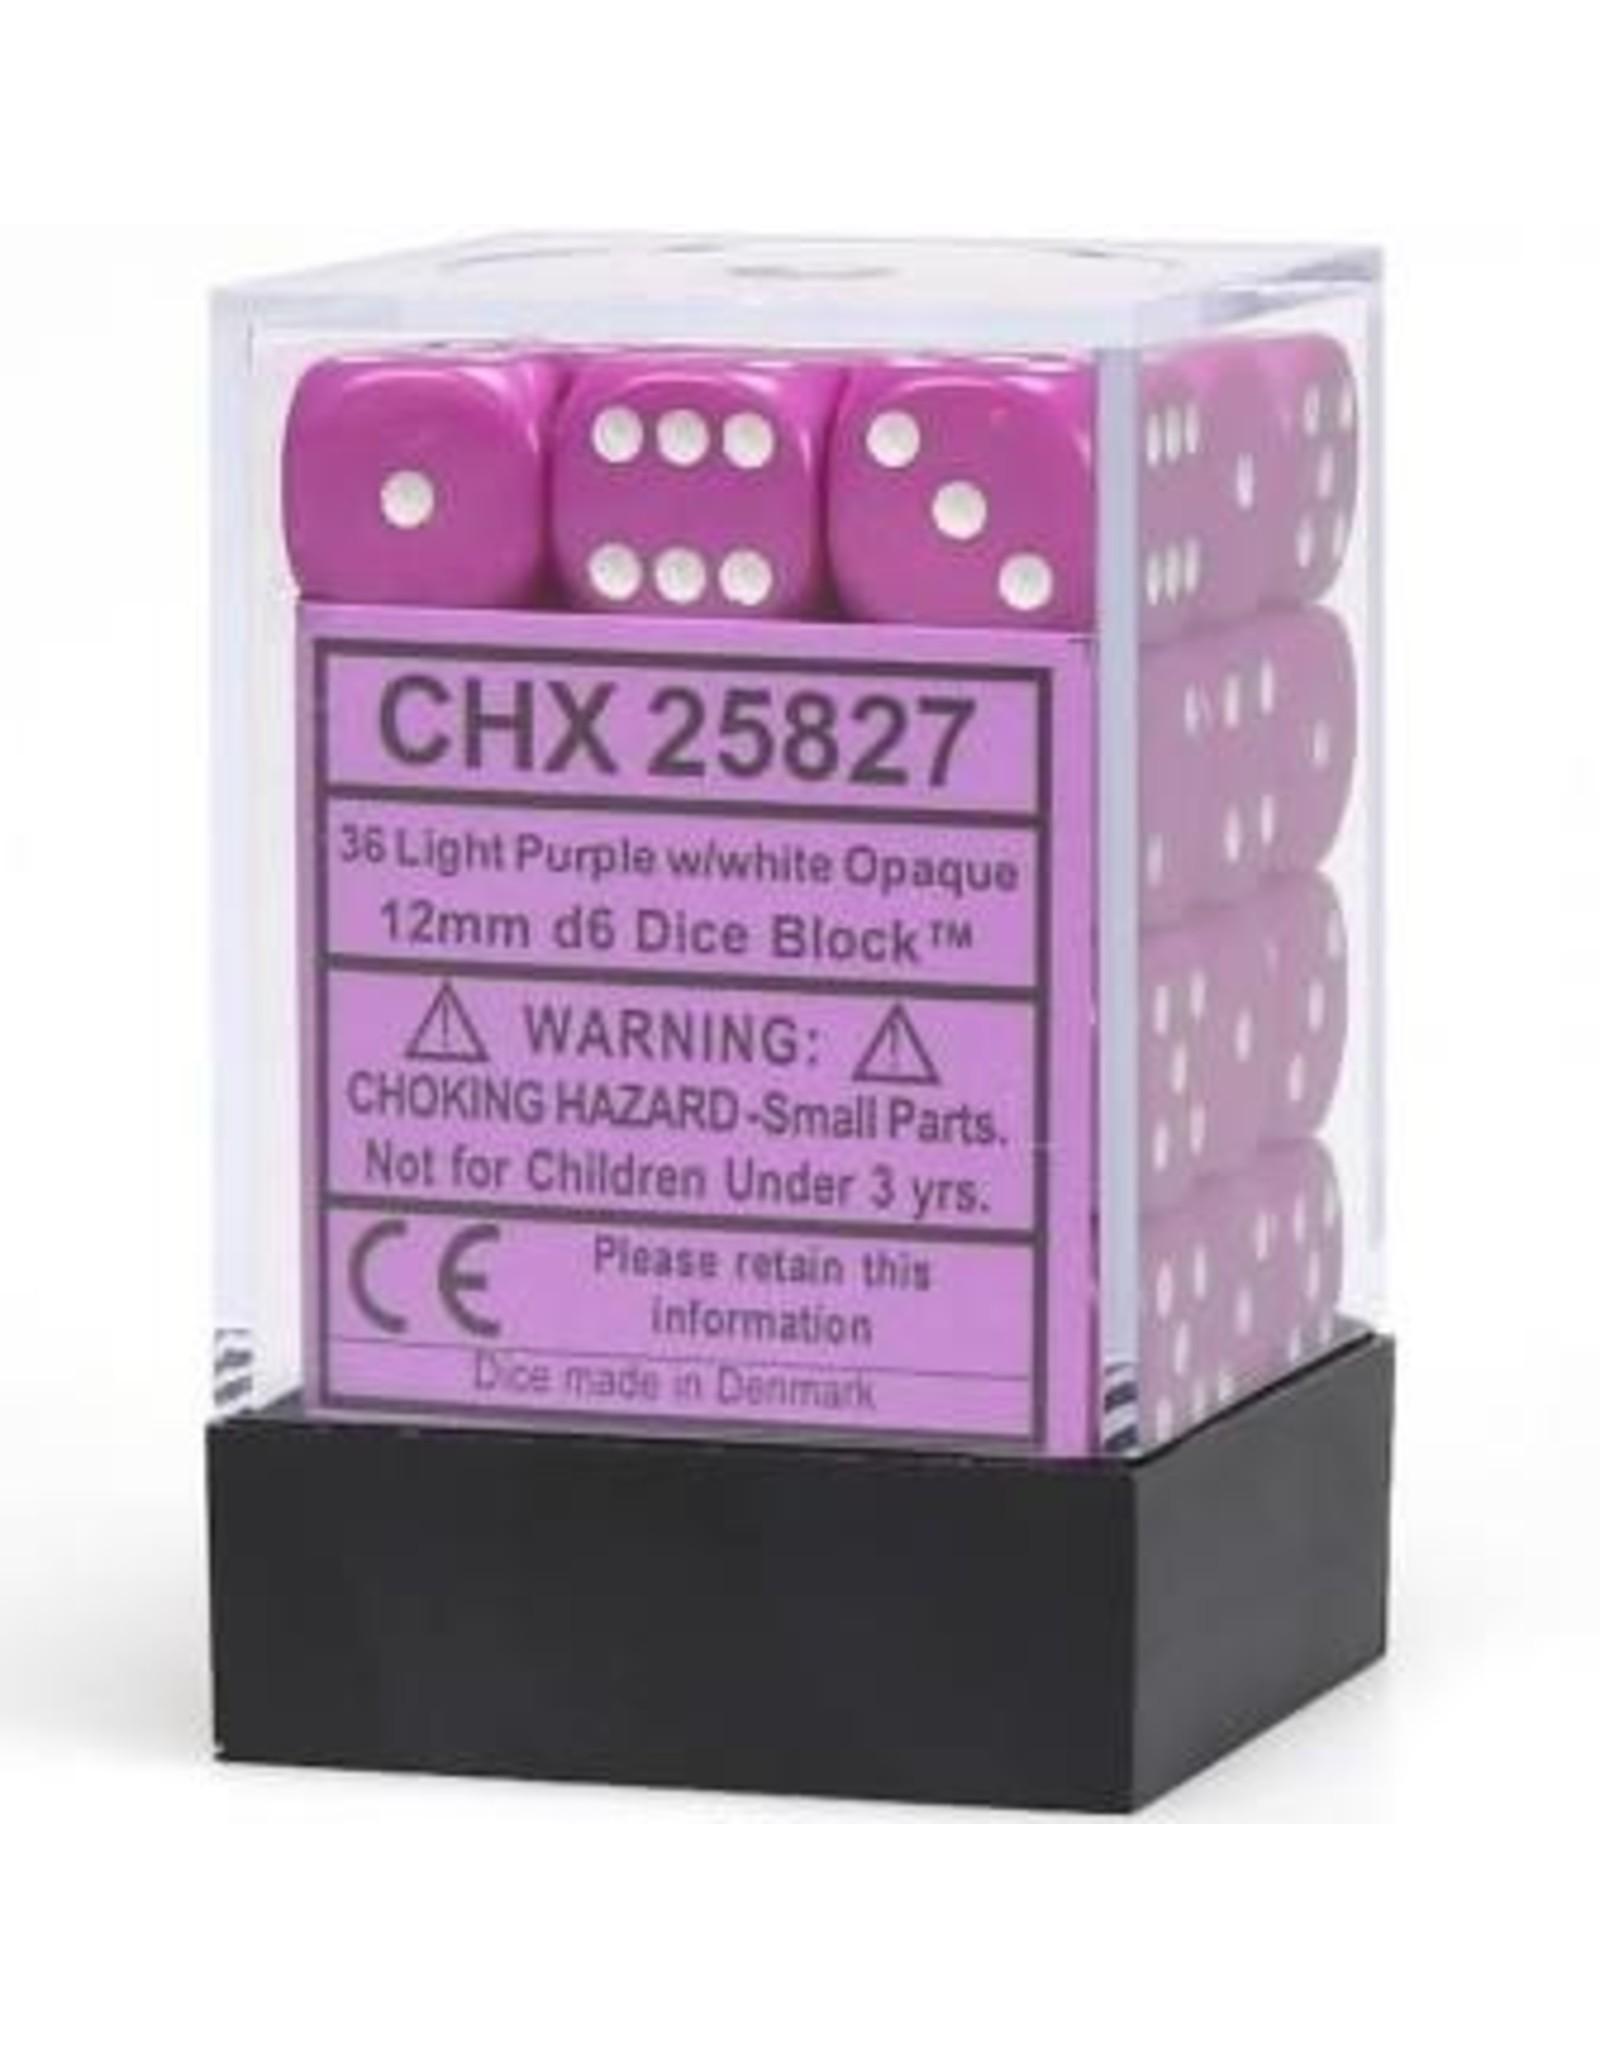 Chessex Light Purple w/white 12mm d6 (36)